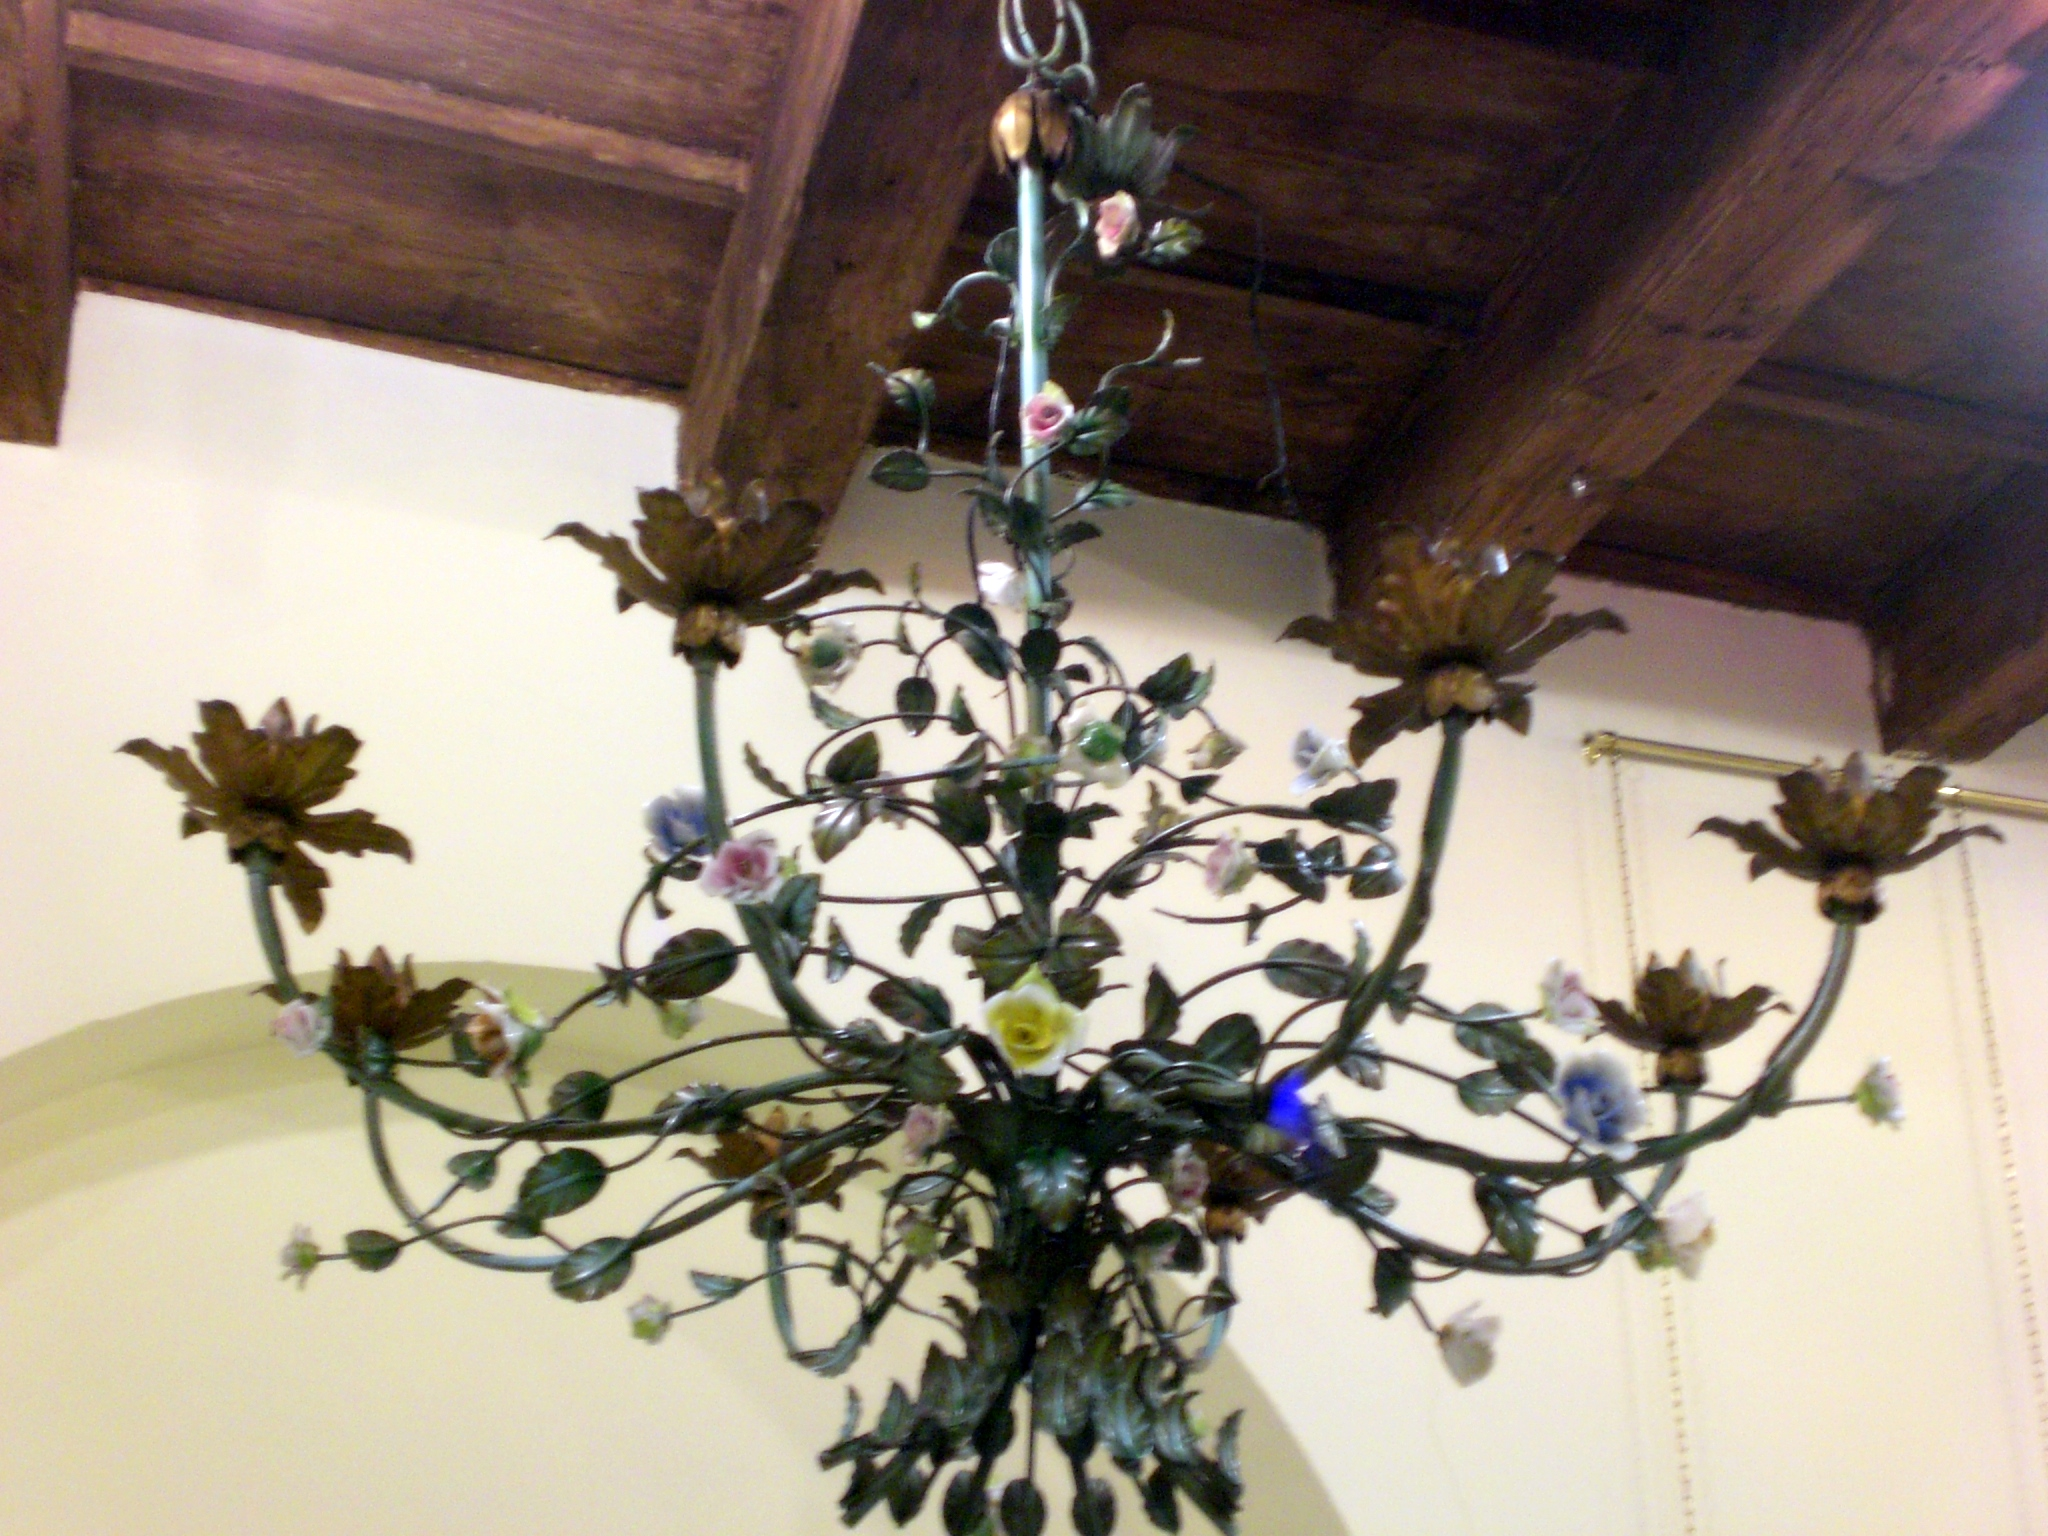 Pastis   Lampadario ferro battuto e roselline in ceramica di Capodimonte -> Lampadari Antichi Capodimonte